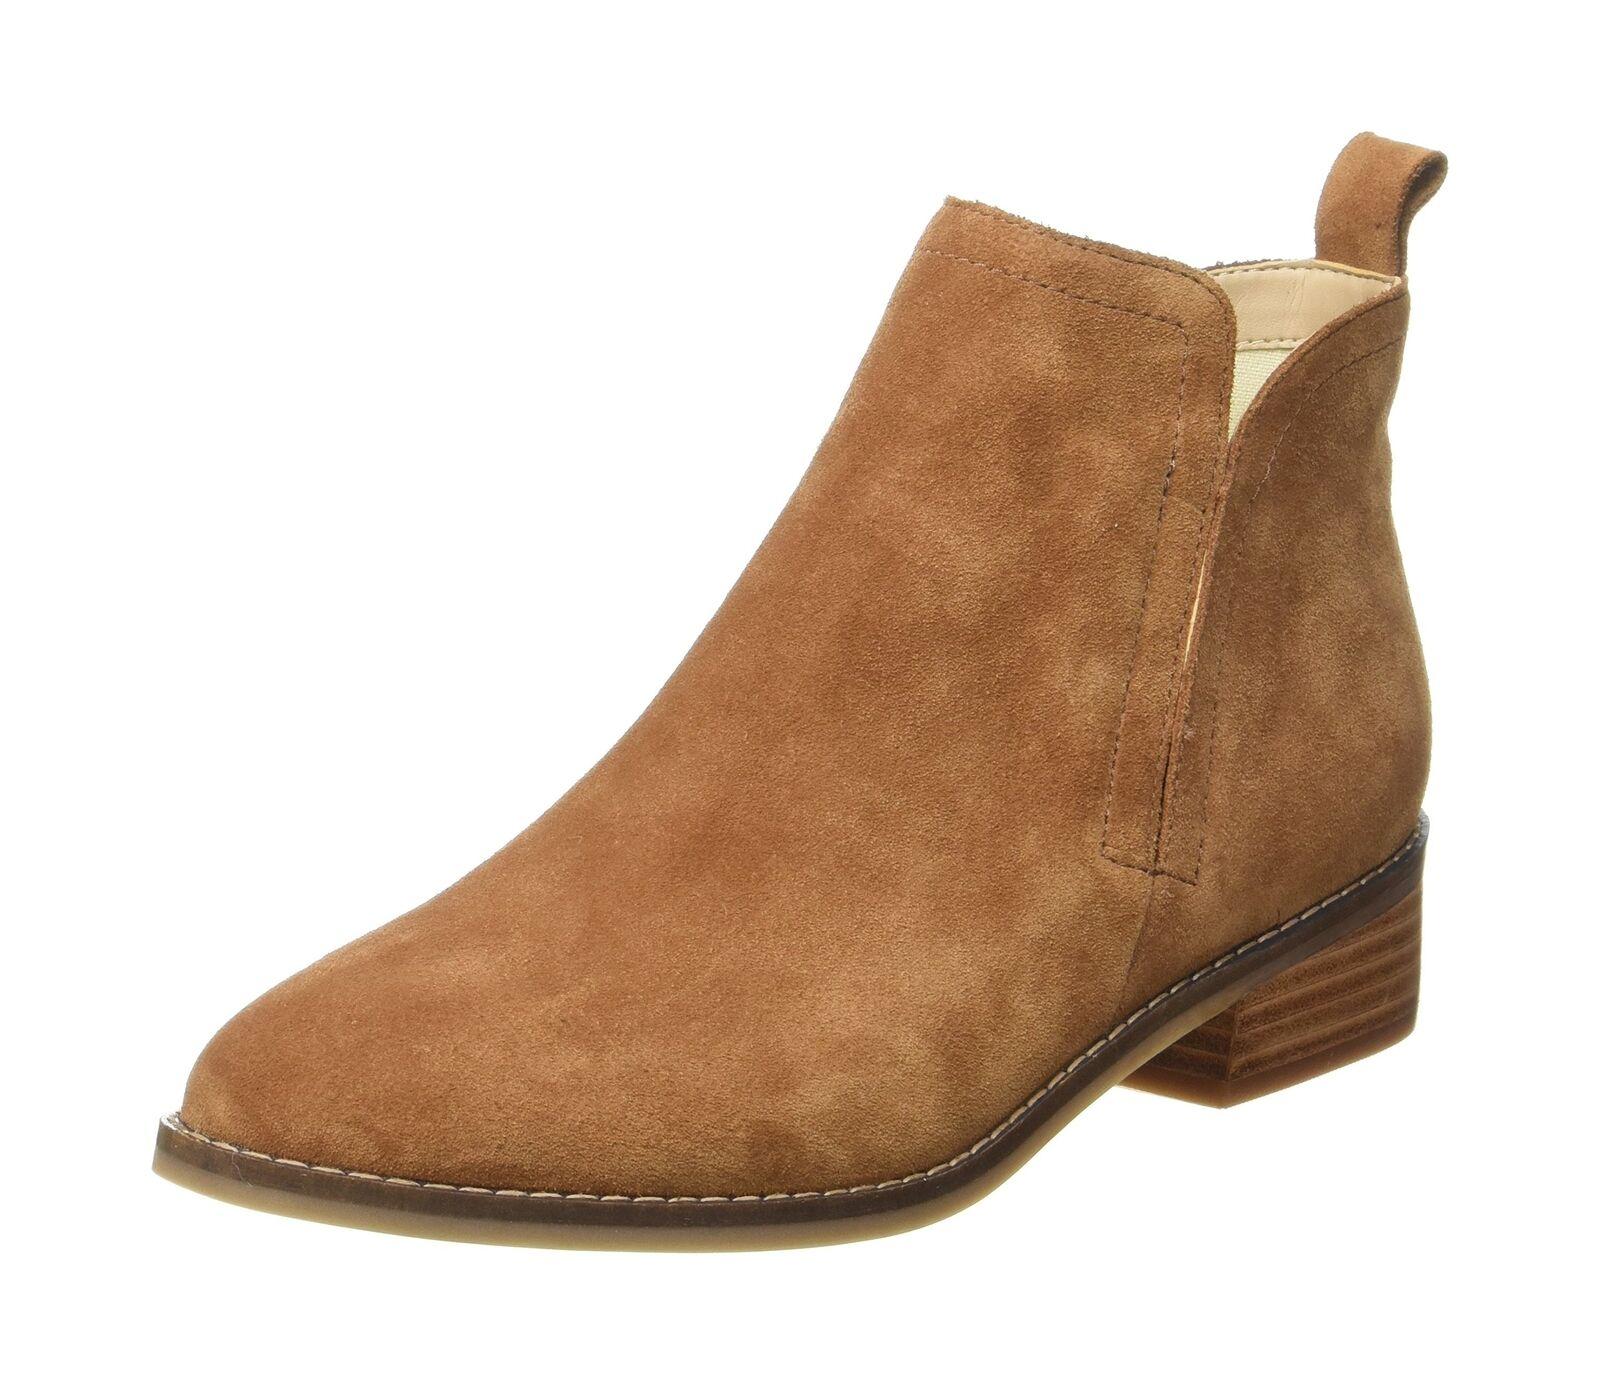 Buffalo botas de ante para mujer Vaca 416-7396 Marrón (tan 01 0) 6.5 Reino Unido